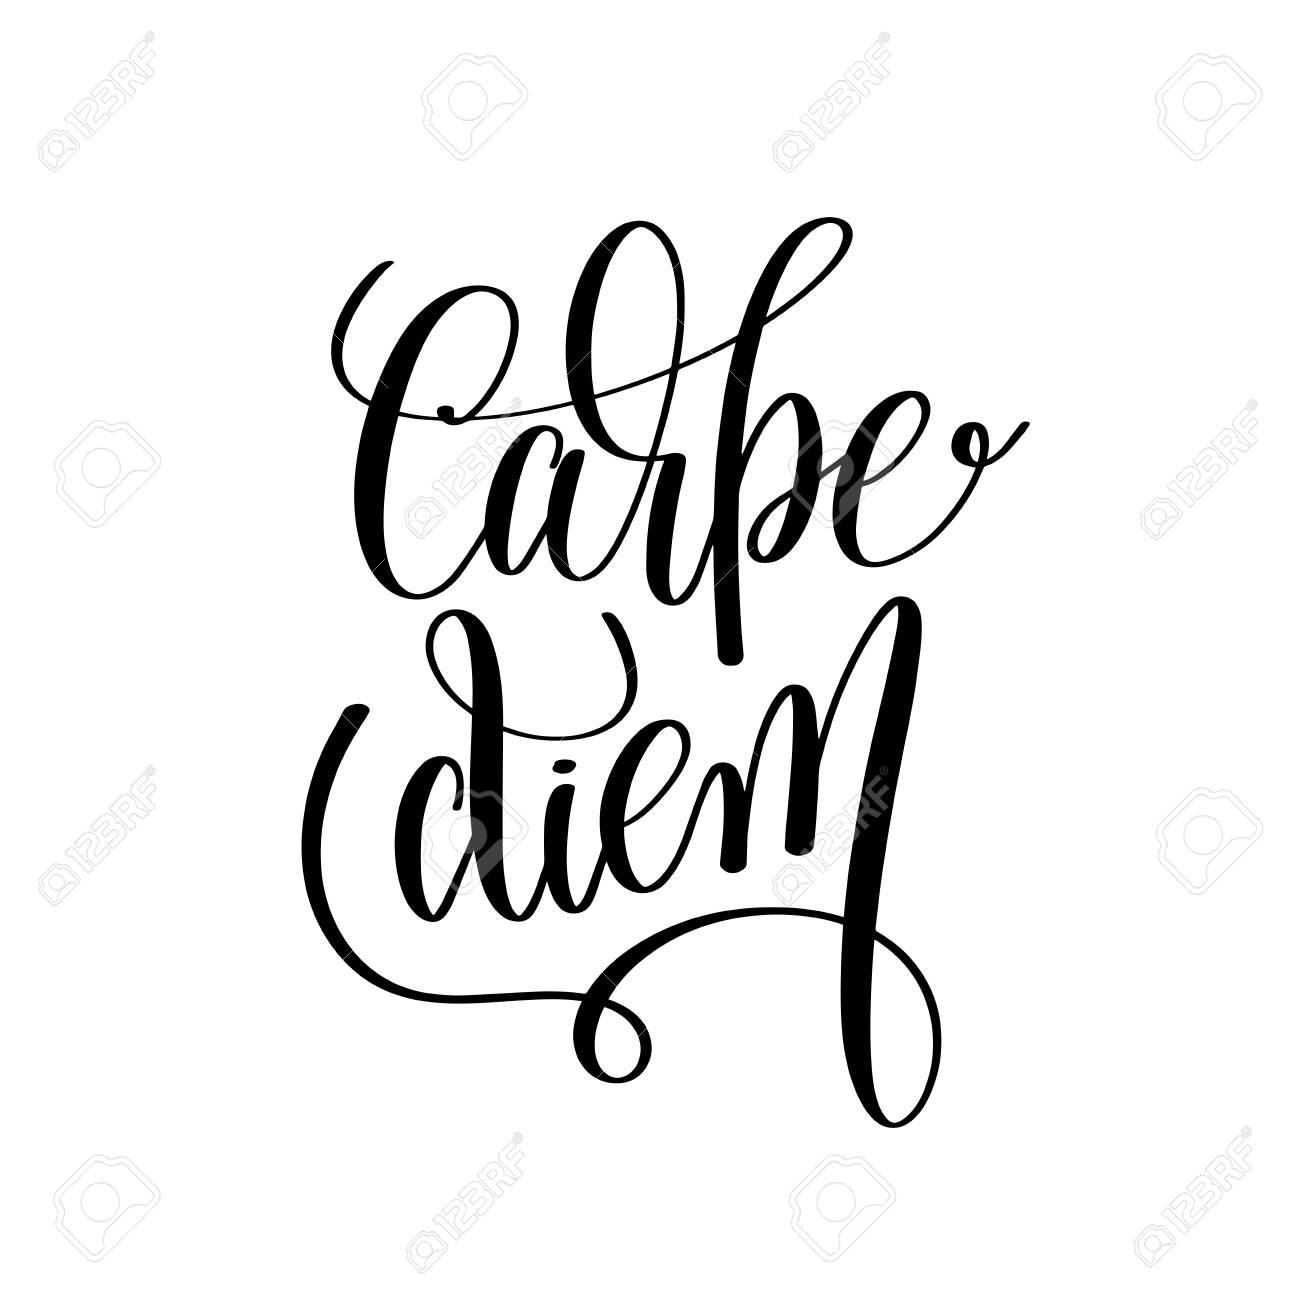 carpe diem full phrase